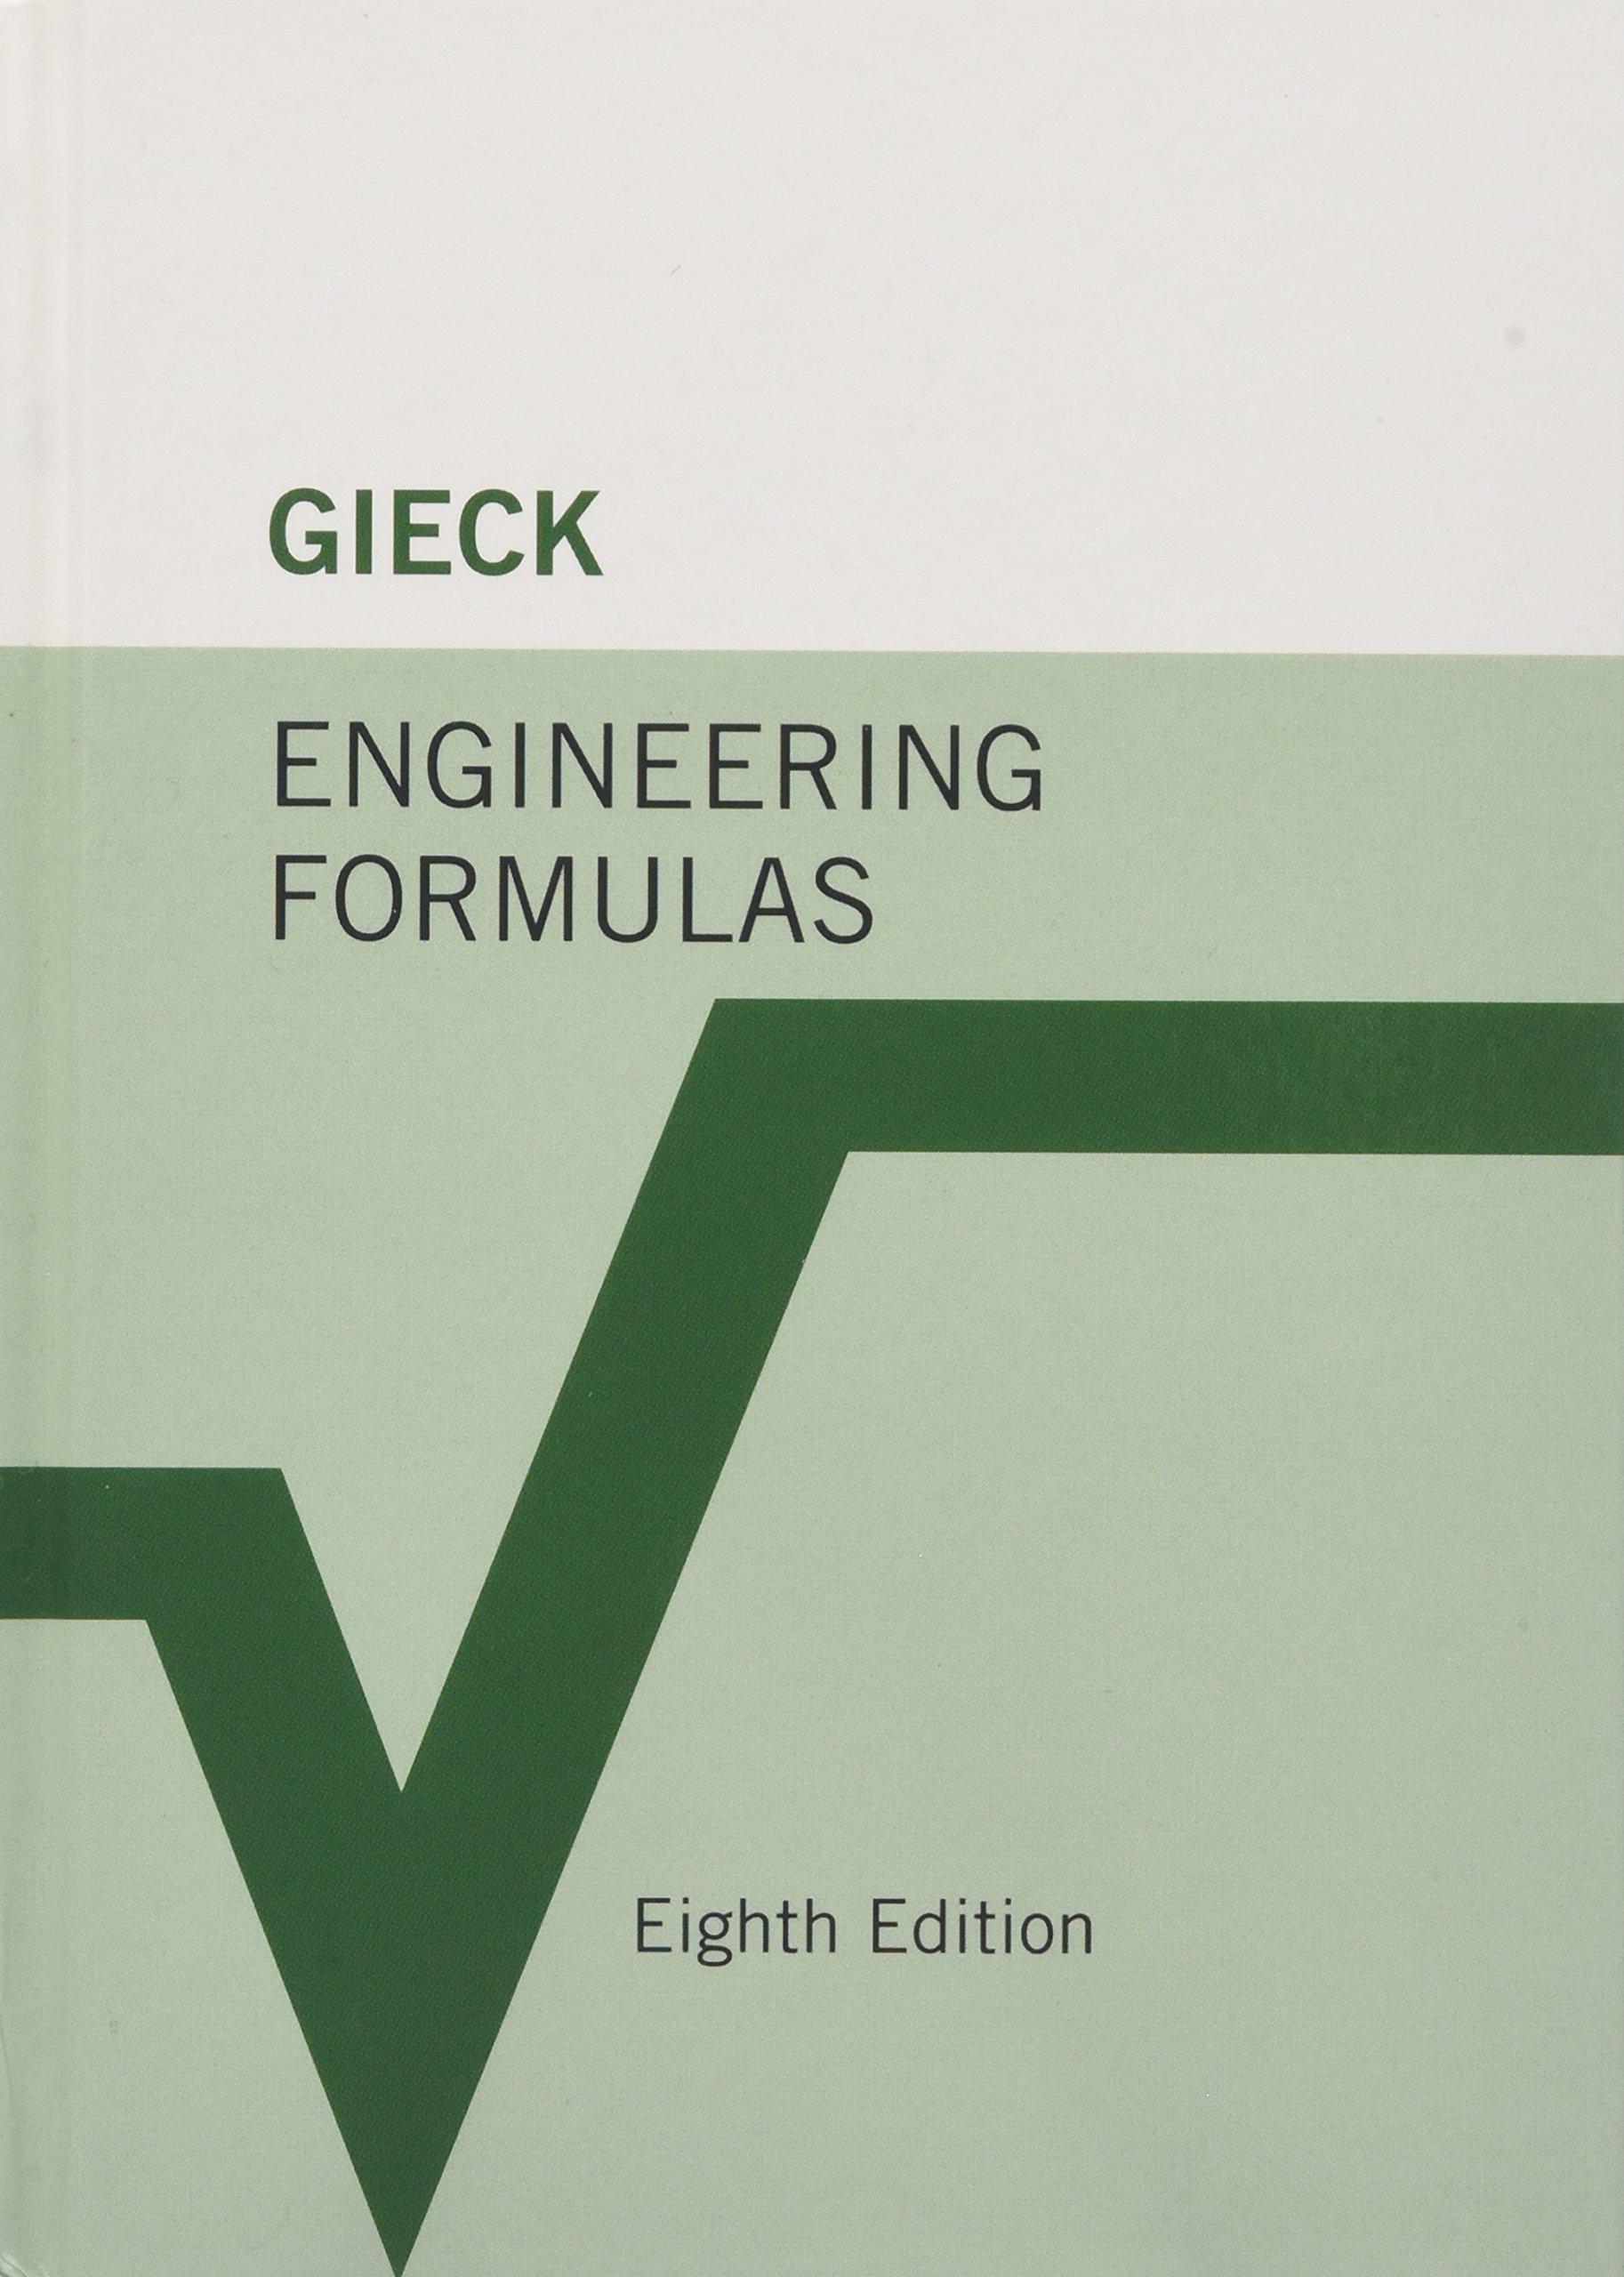 Engineering Formulas: Amazon.es: Kurt Gieck, Reiner Gieck: Libros en idiomas extranjeros